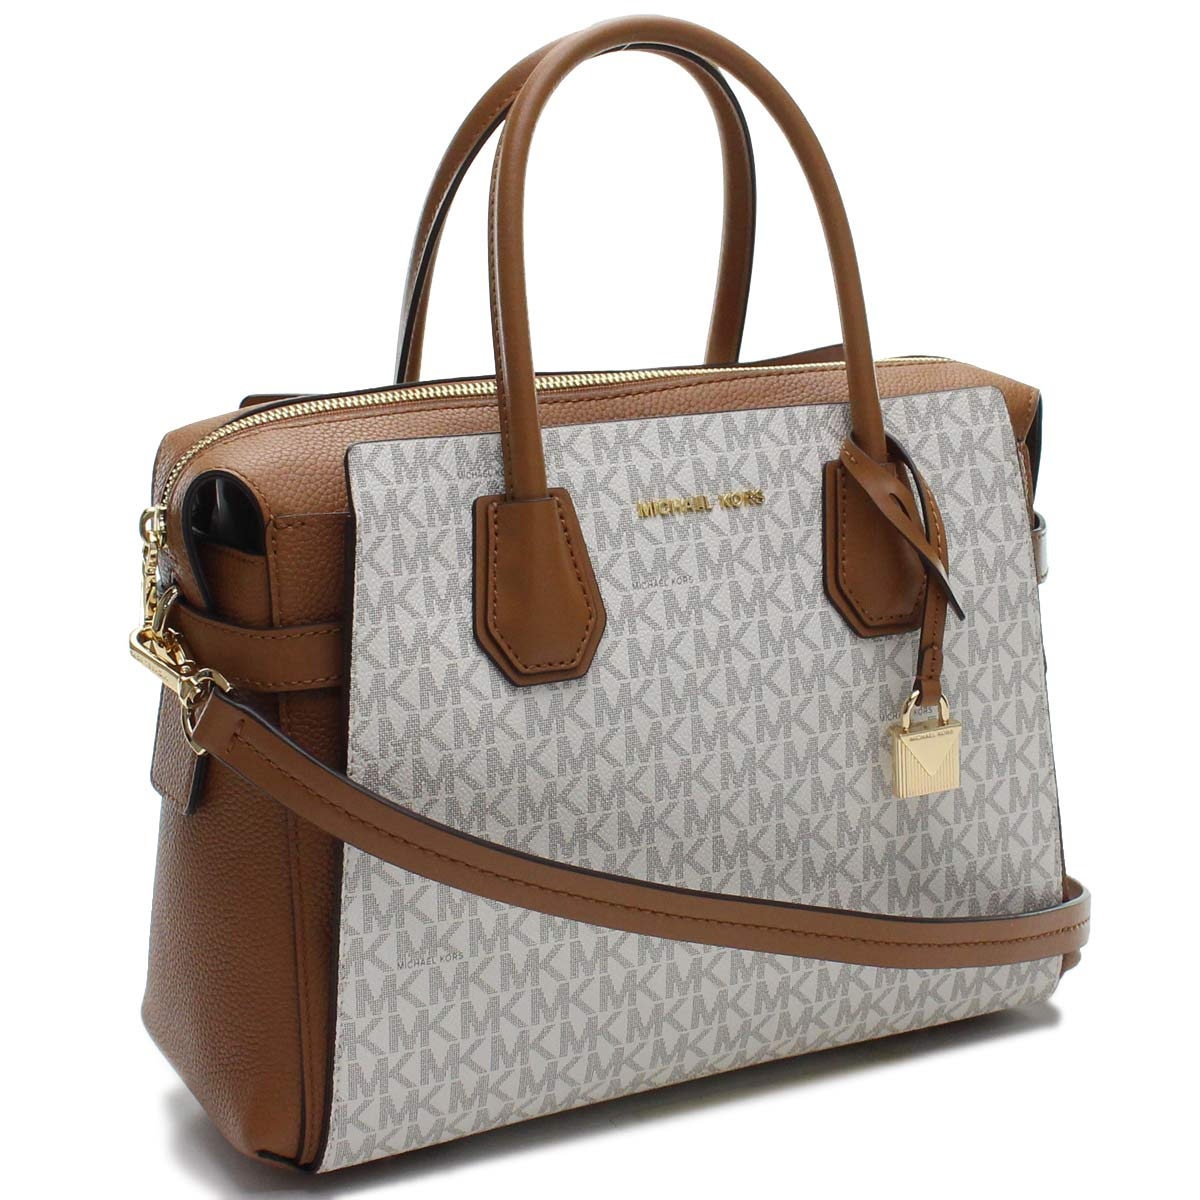 Michael Kors Mercer 2way Handbag 30s9gm9s2b 149 Vanilla Acrn White System Lady S